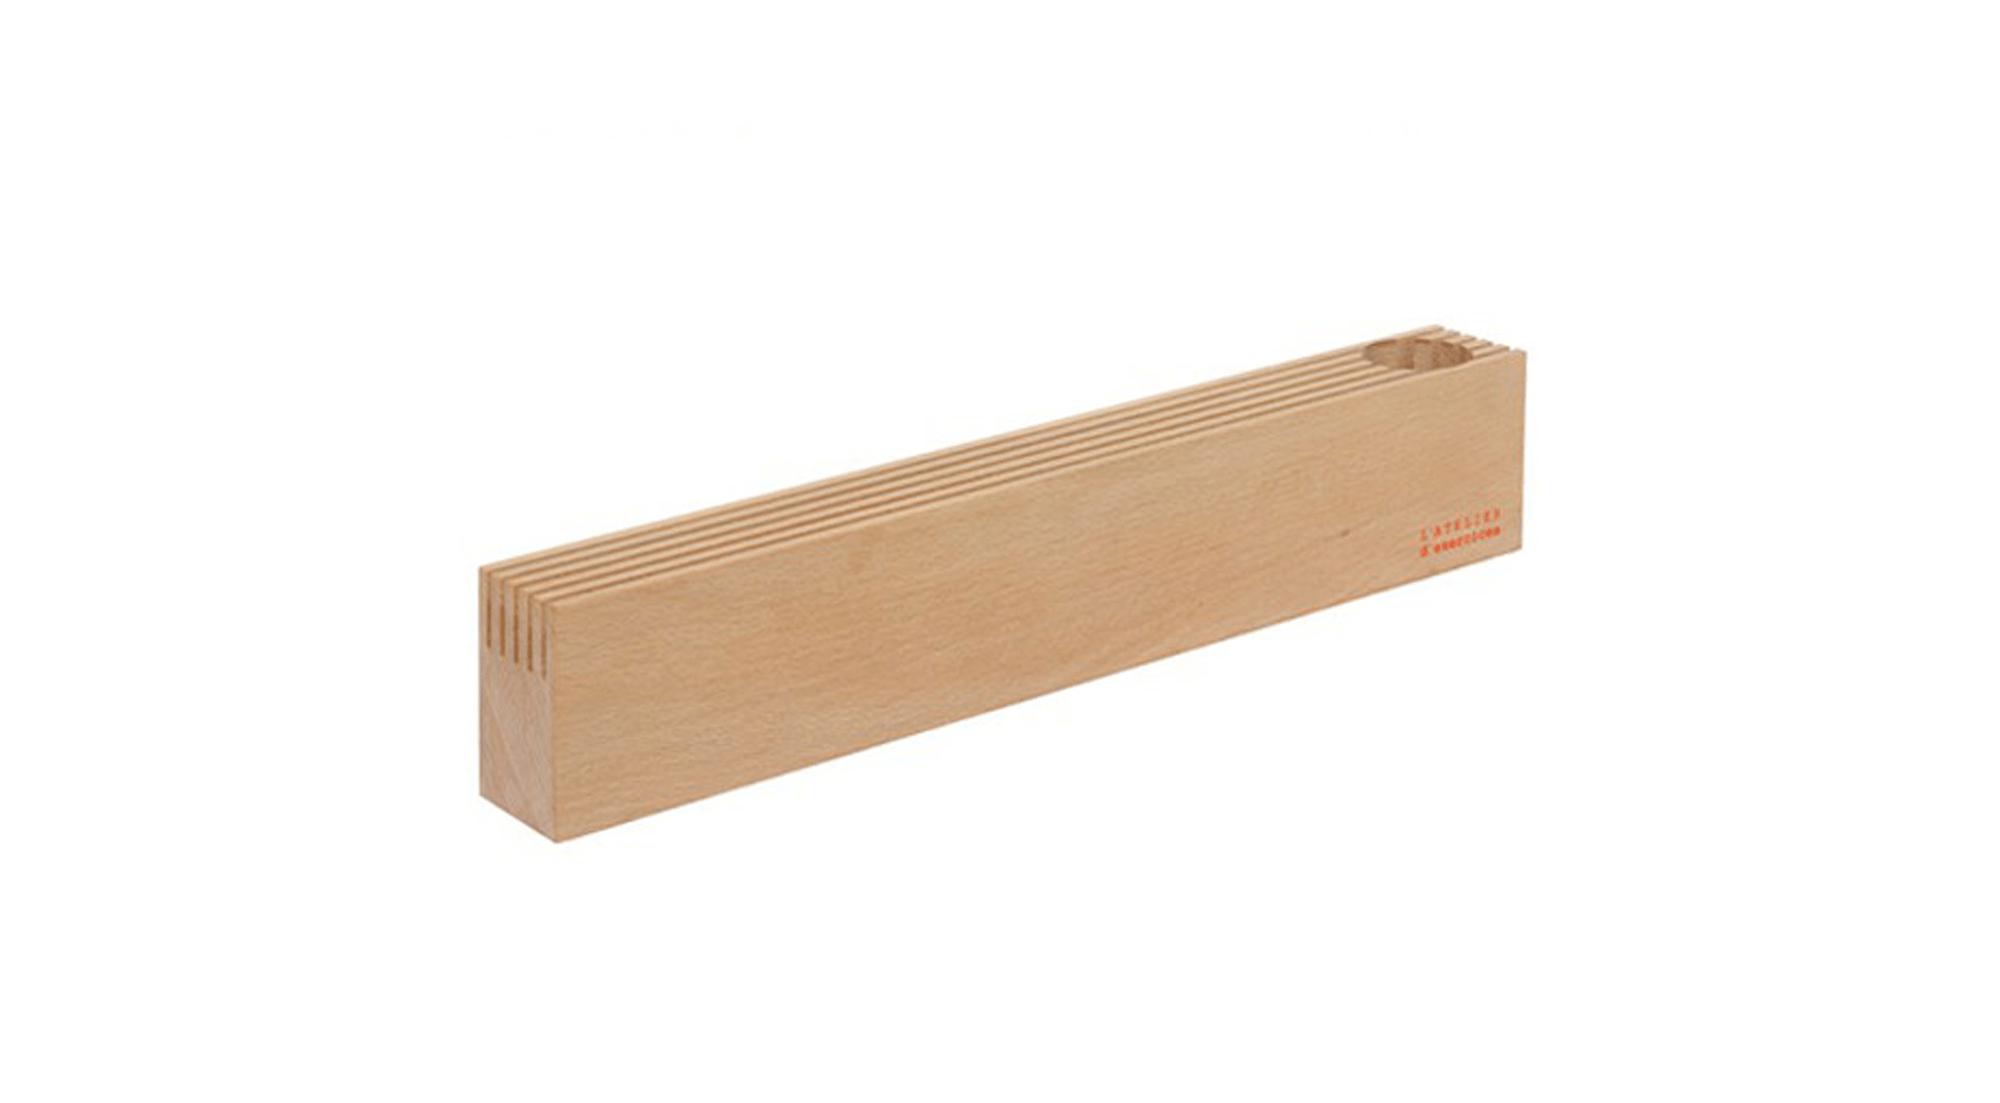 DesignApplause Wood Block Desk Organizer Latelier D